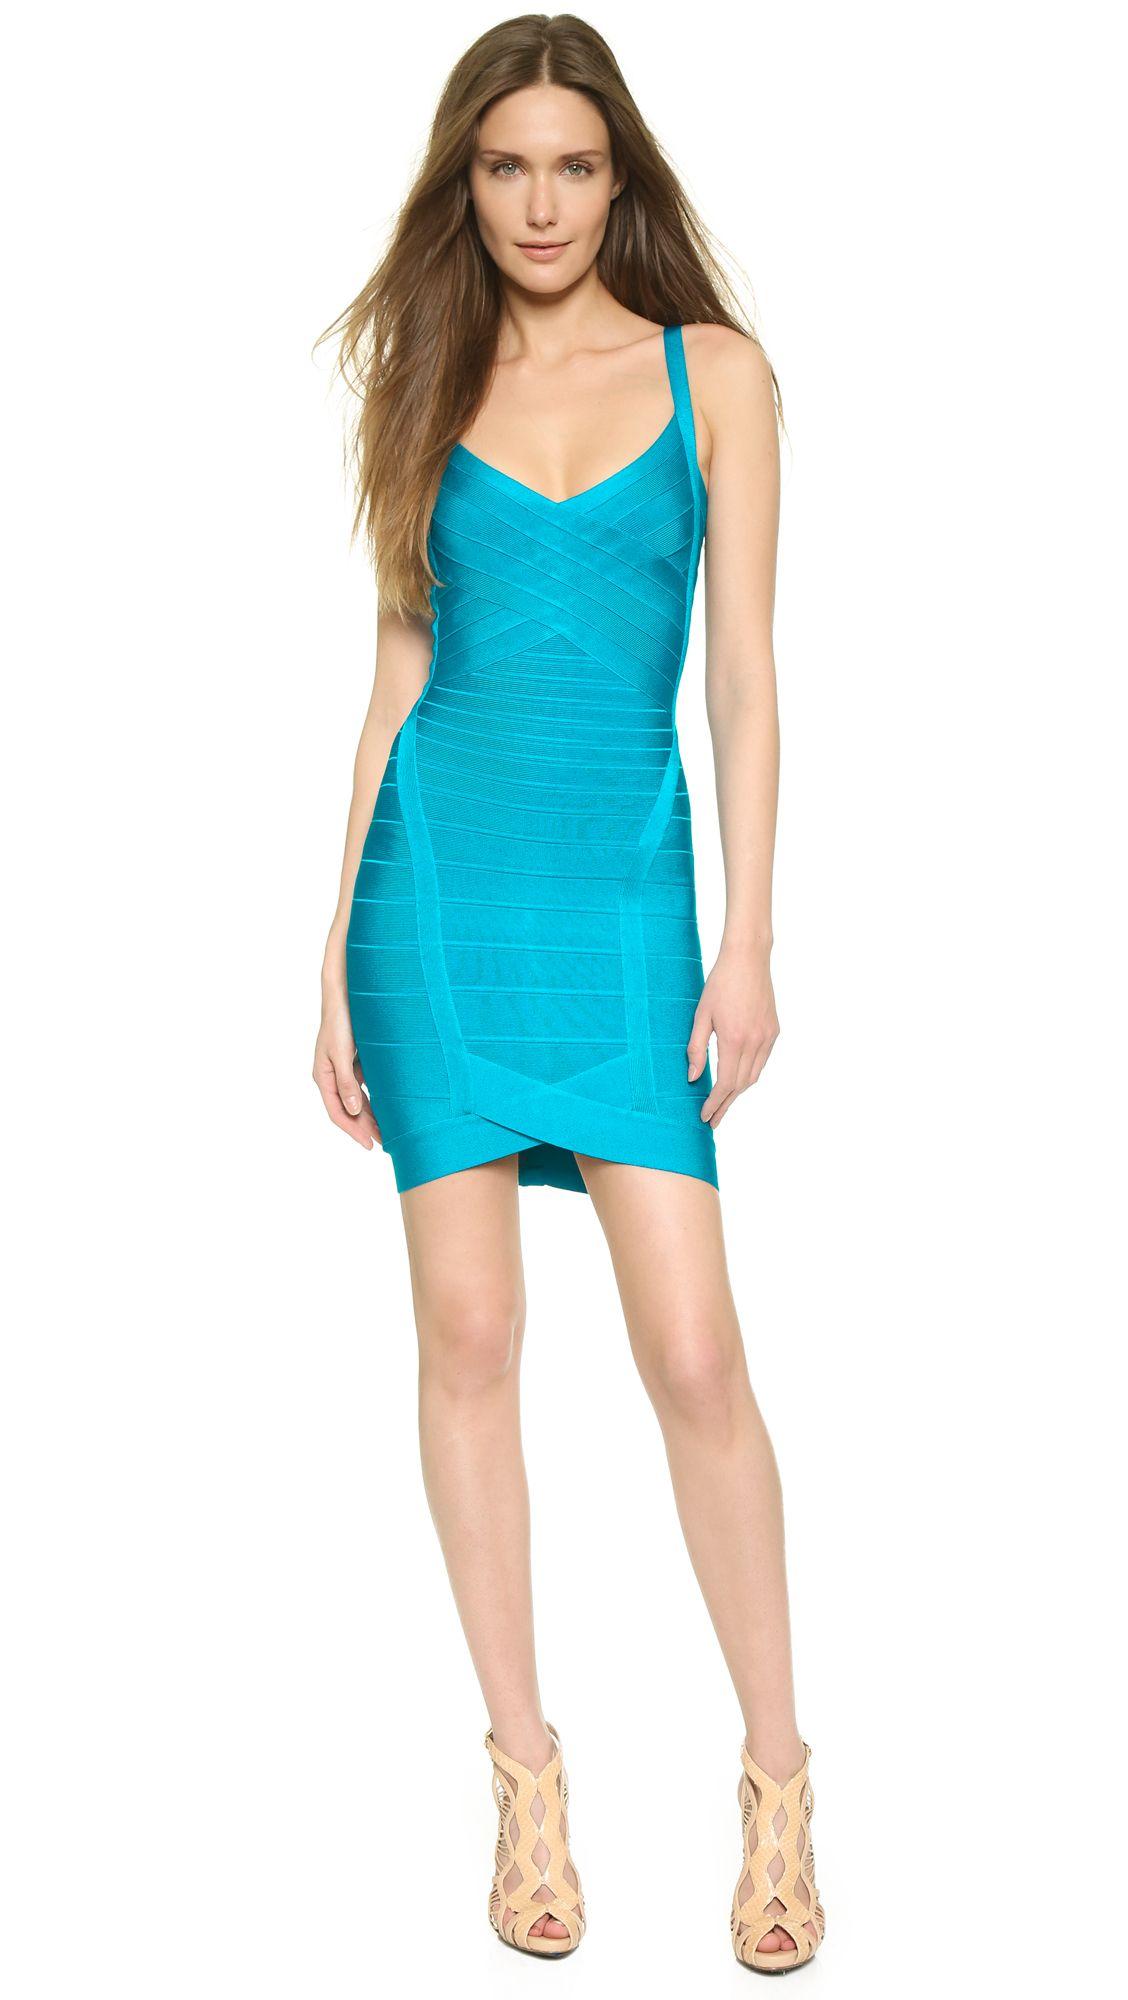 Herve leger bright turquoise blue kourtney dress dresses